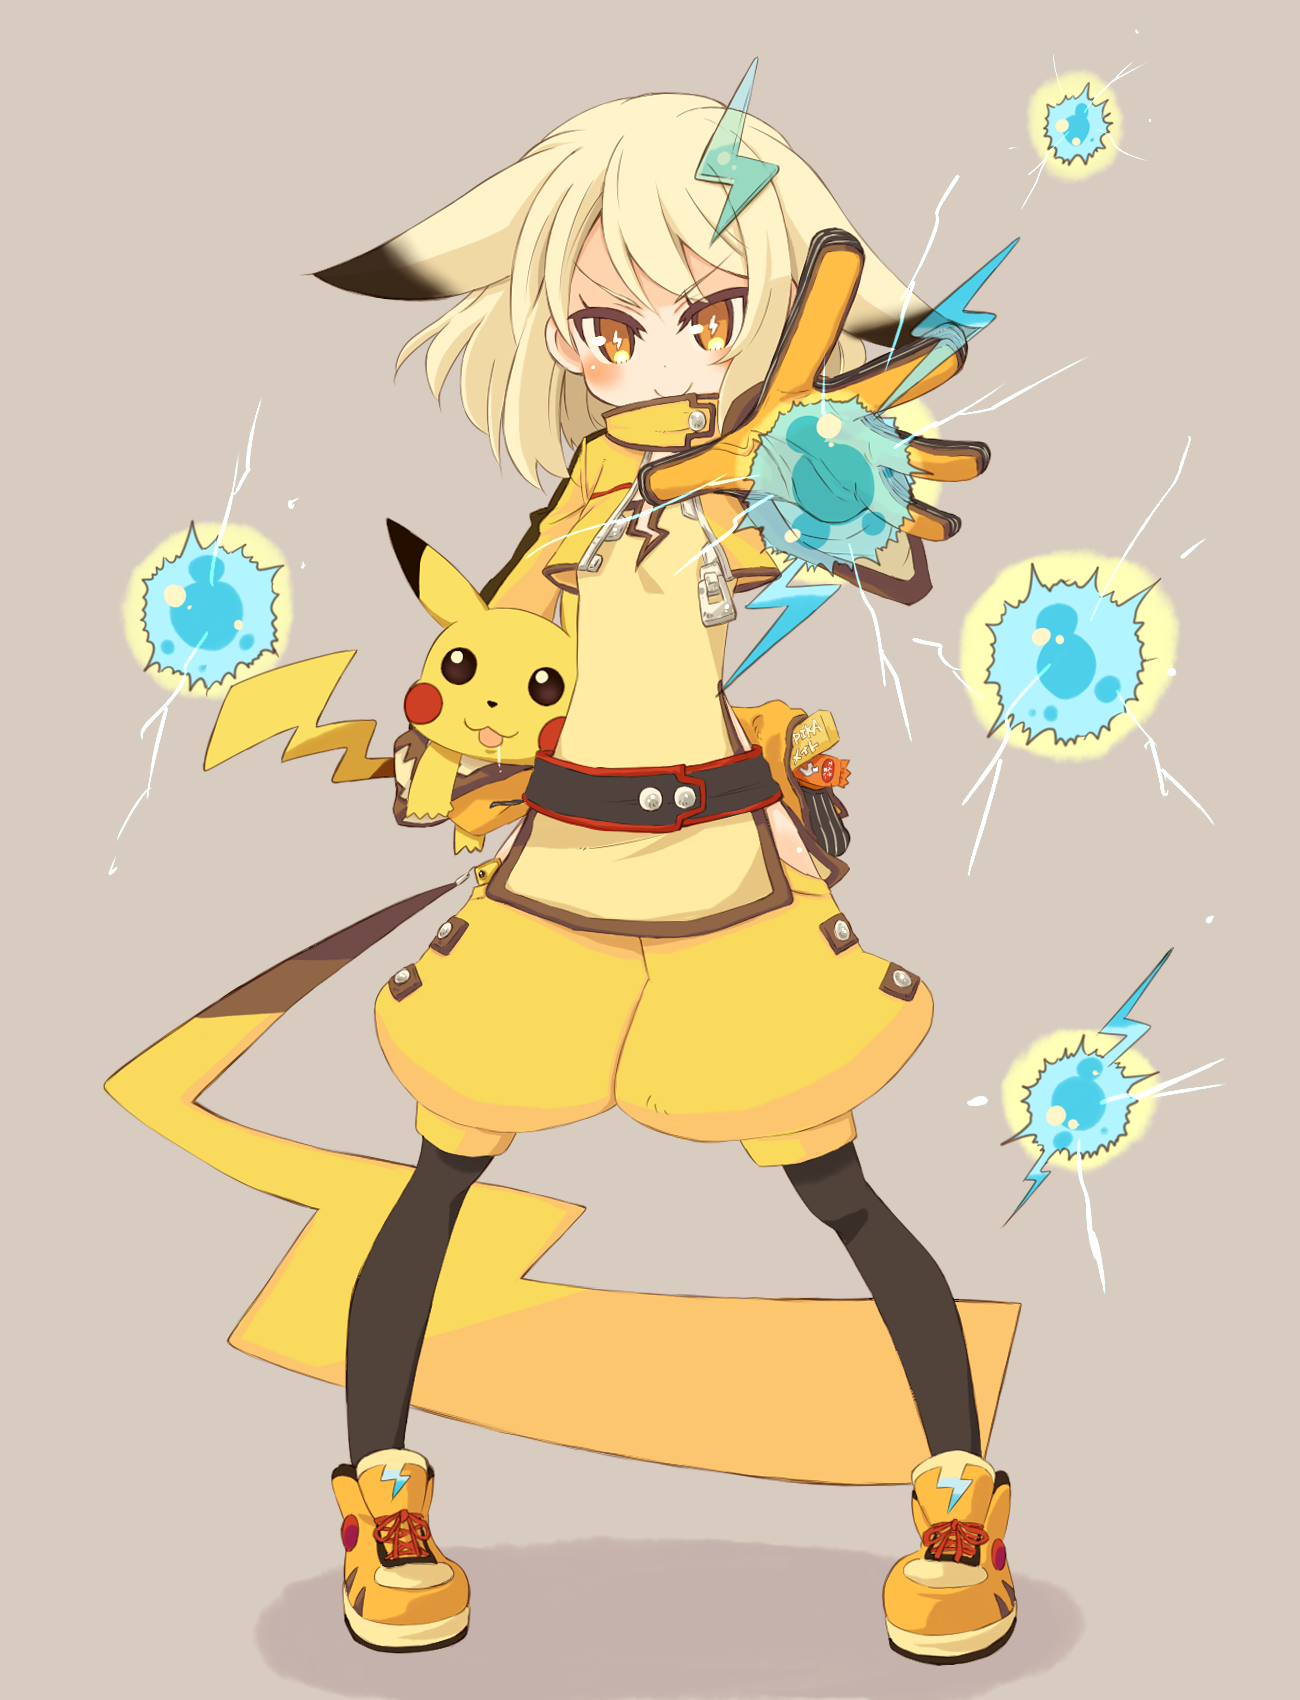 25 Pikachu Pokemon gijinka, Pikachu, Pikachu art